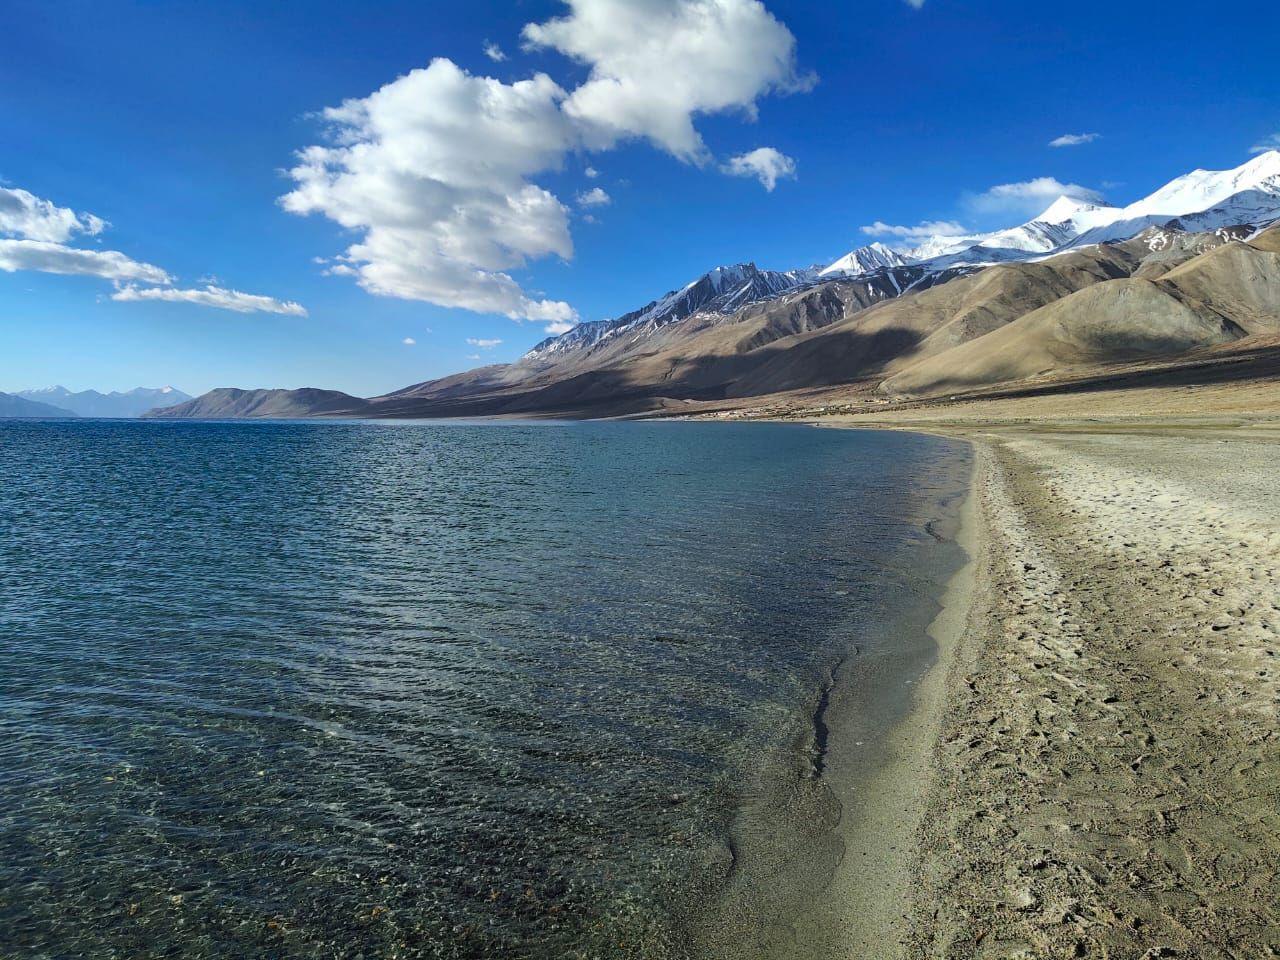 Photo of Pangong Lake By Atul Jain